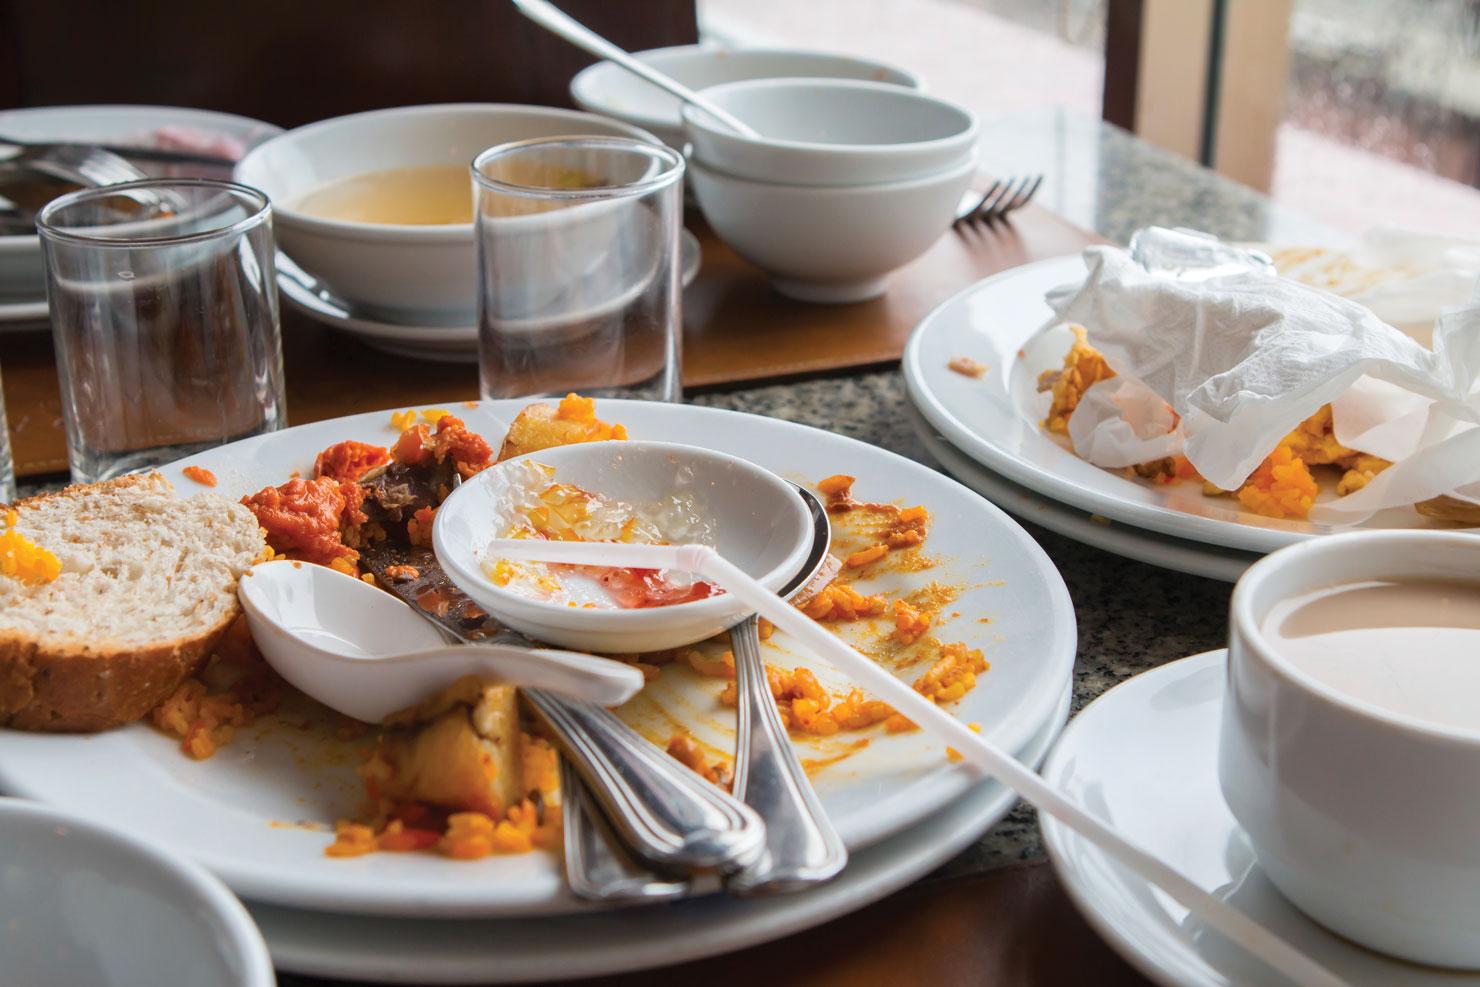 Restaurant Food Waste Facts